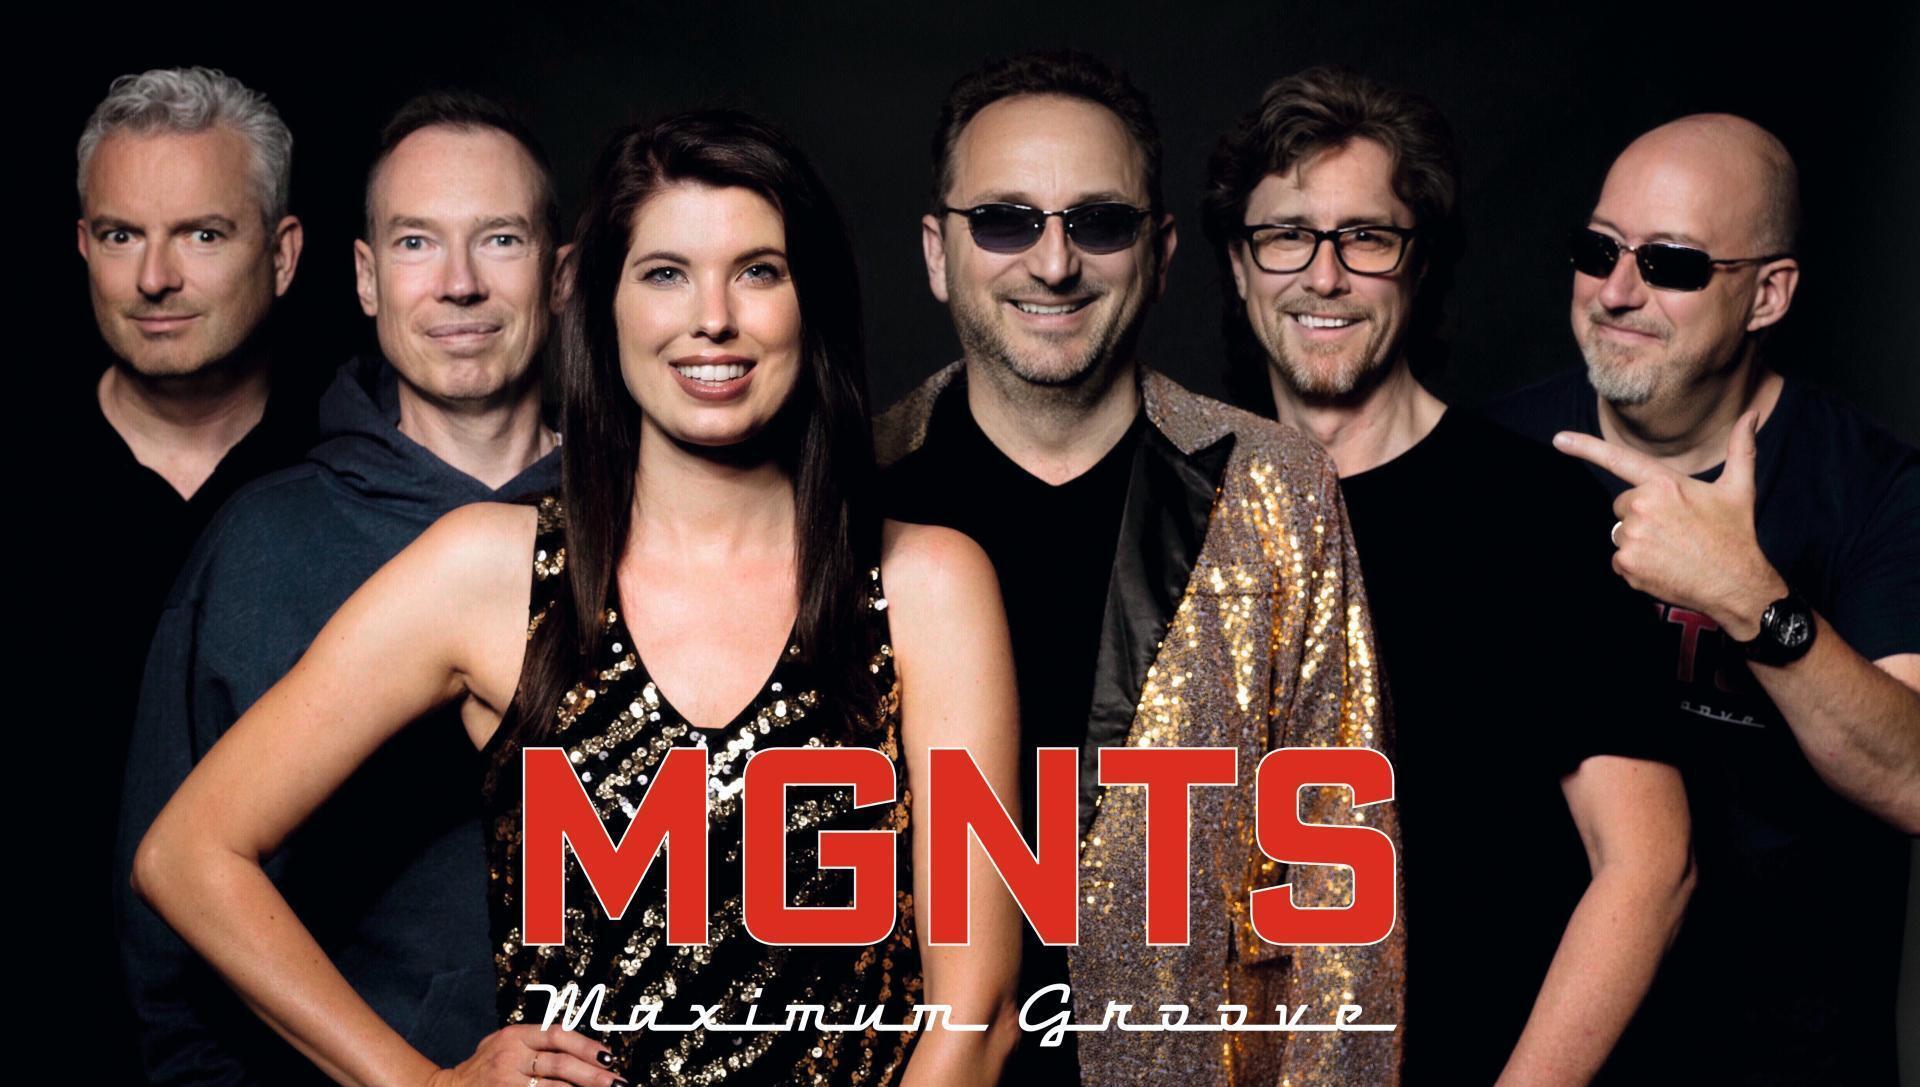 MGNTS